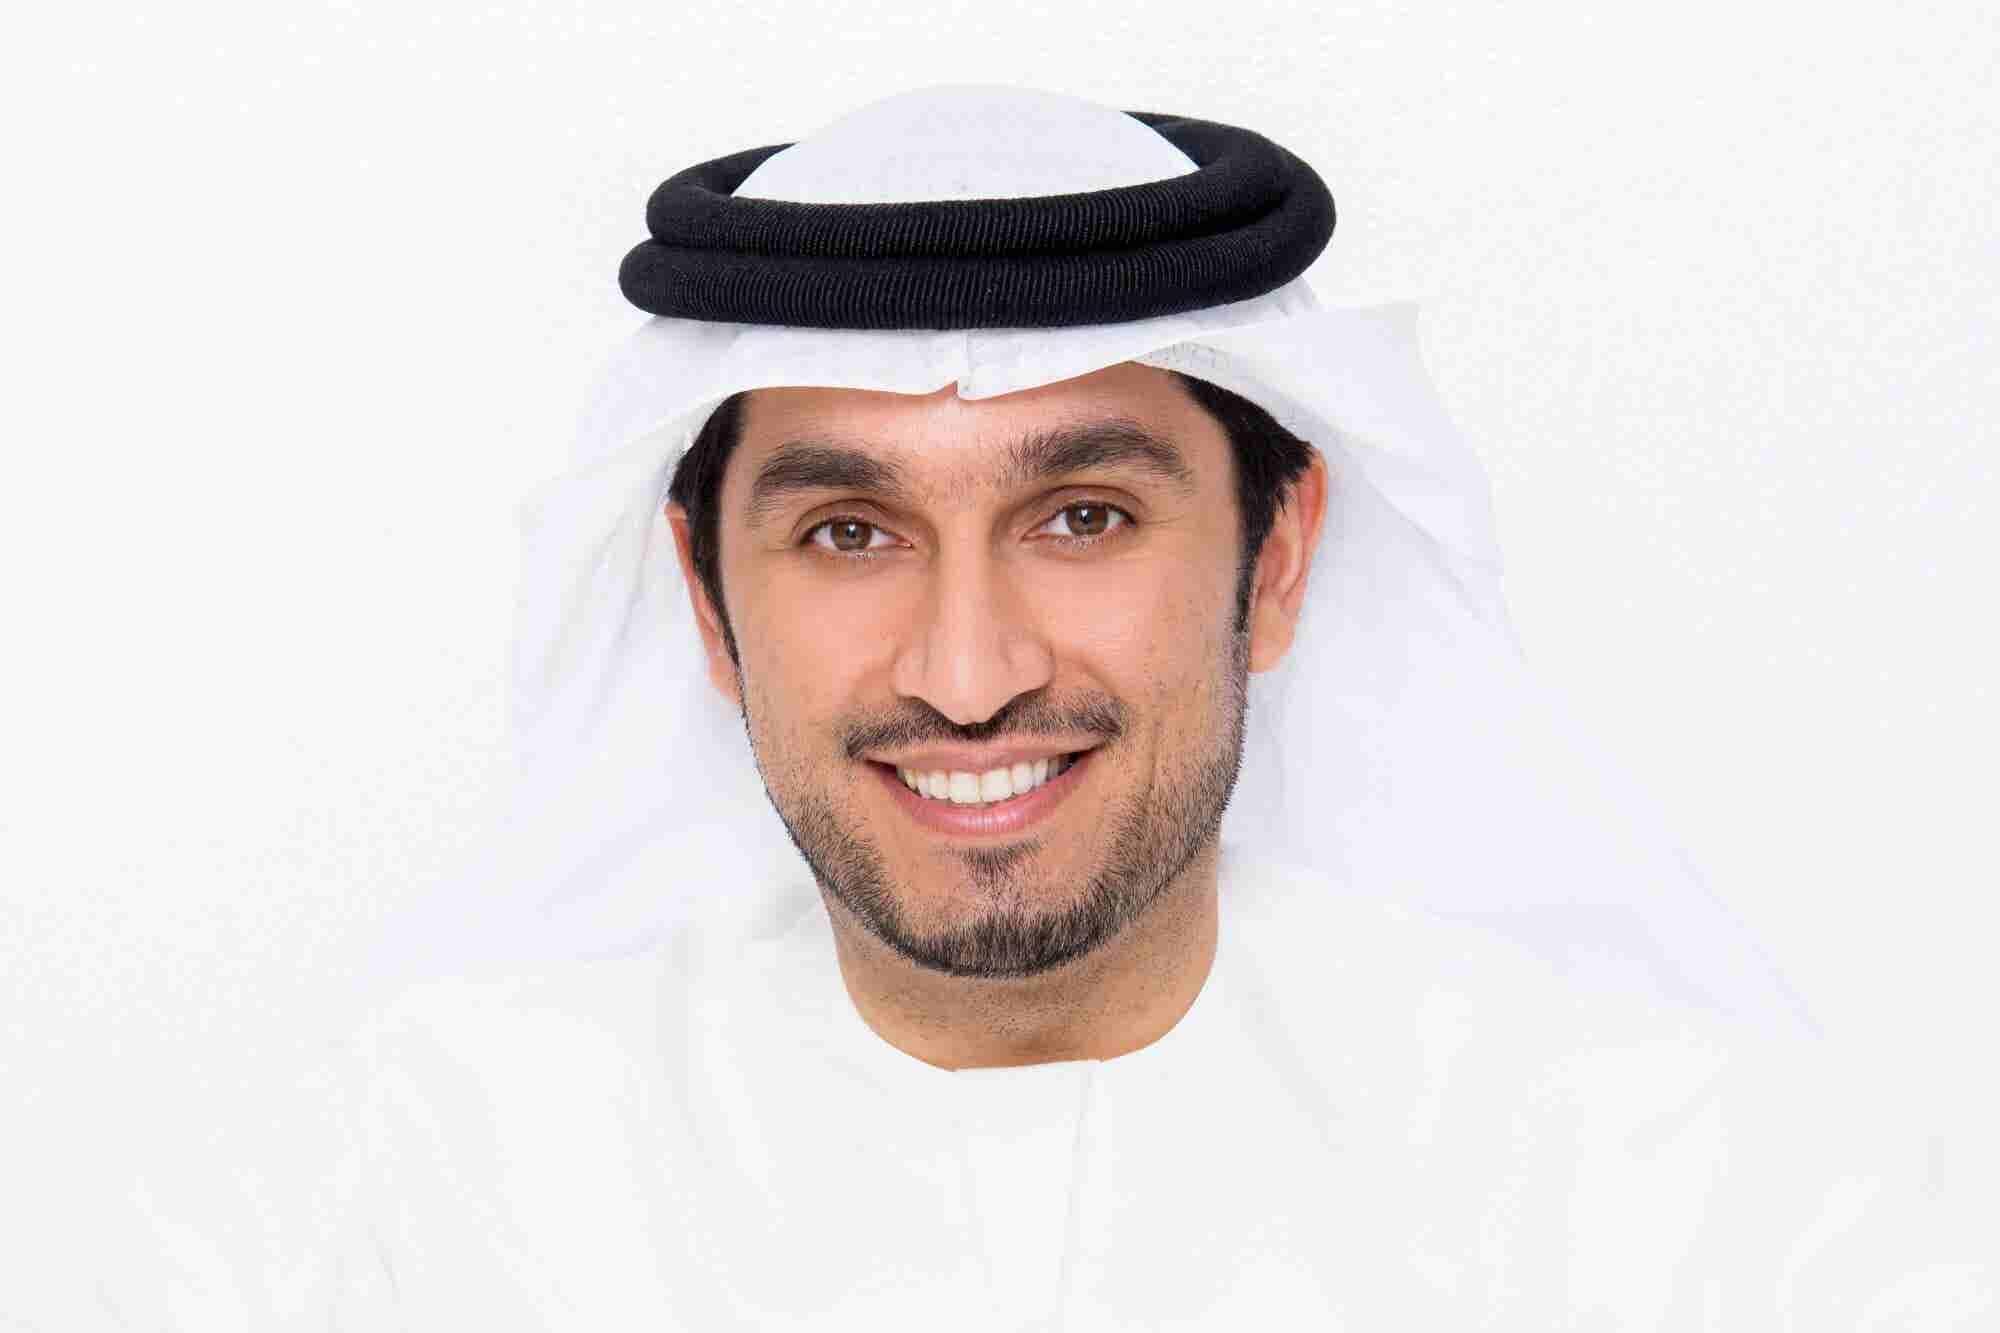 Follow The Leader: Mohammad Saeed Al-Shehhi, CEO, Dubai Design District (d3)